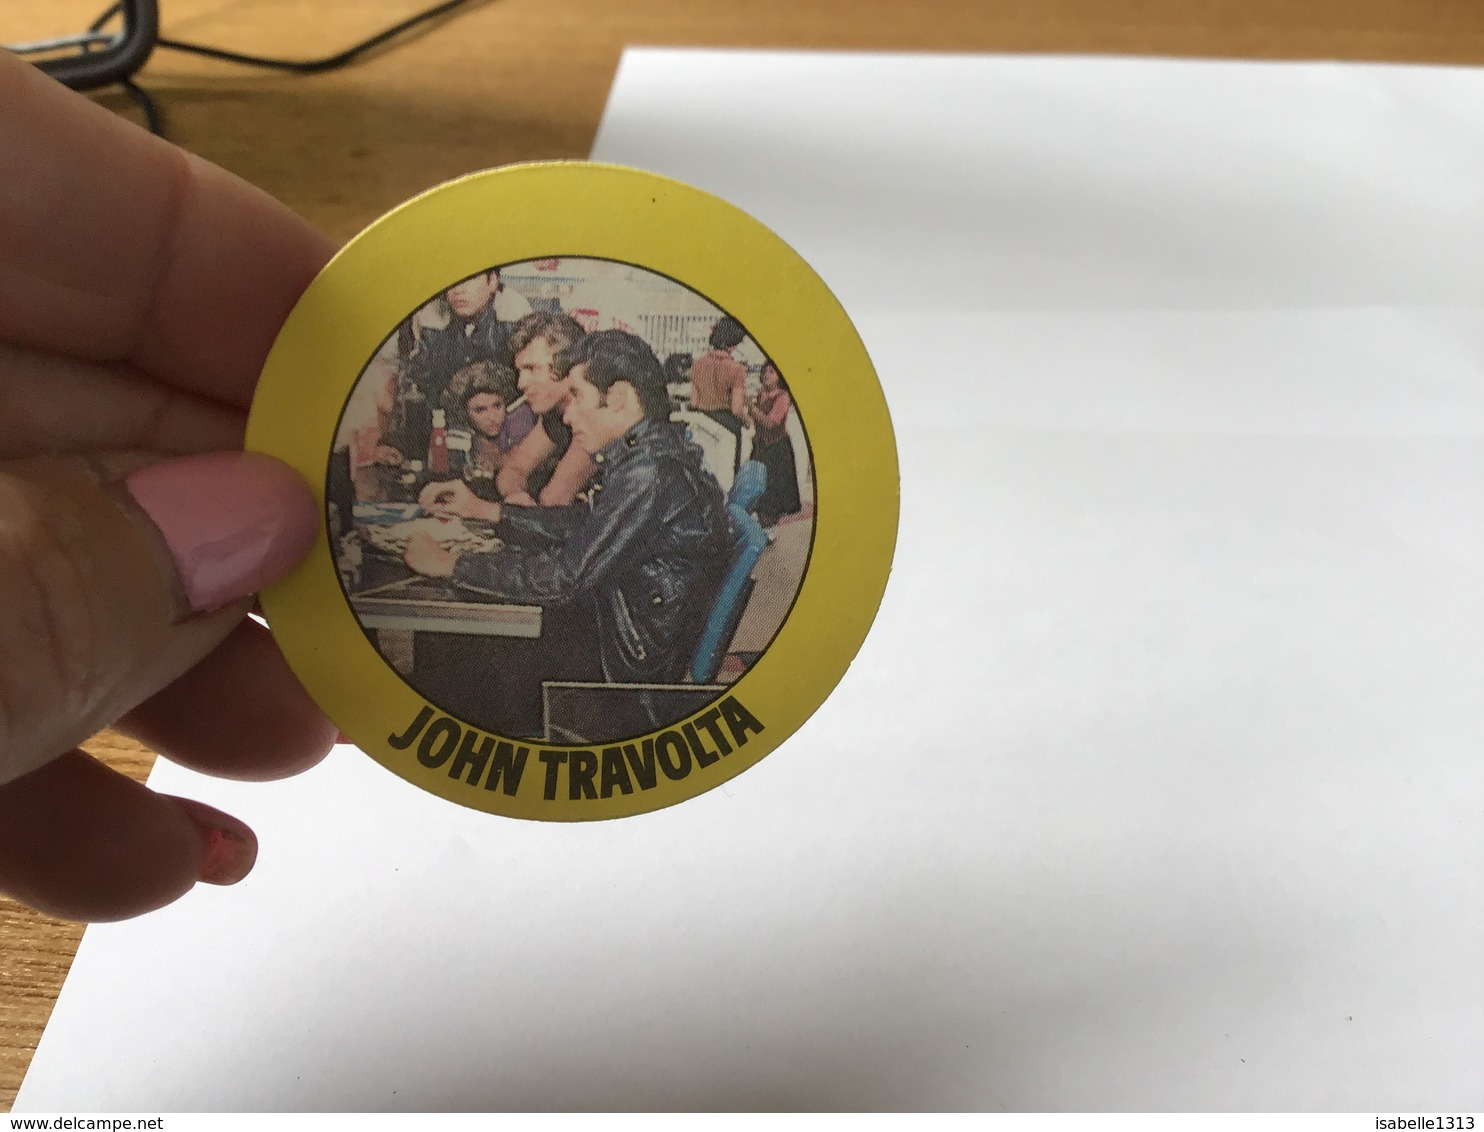 Autocollant Années 80 John Travolta - Autocollants